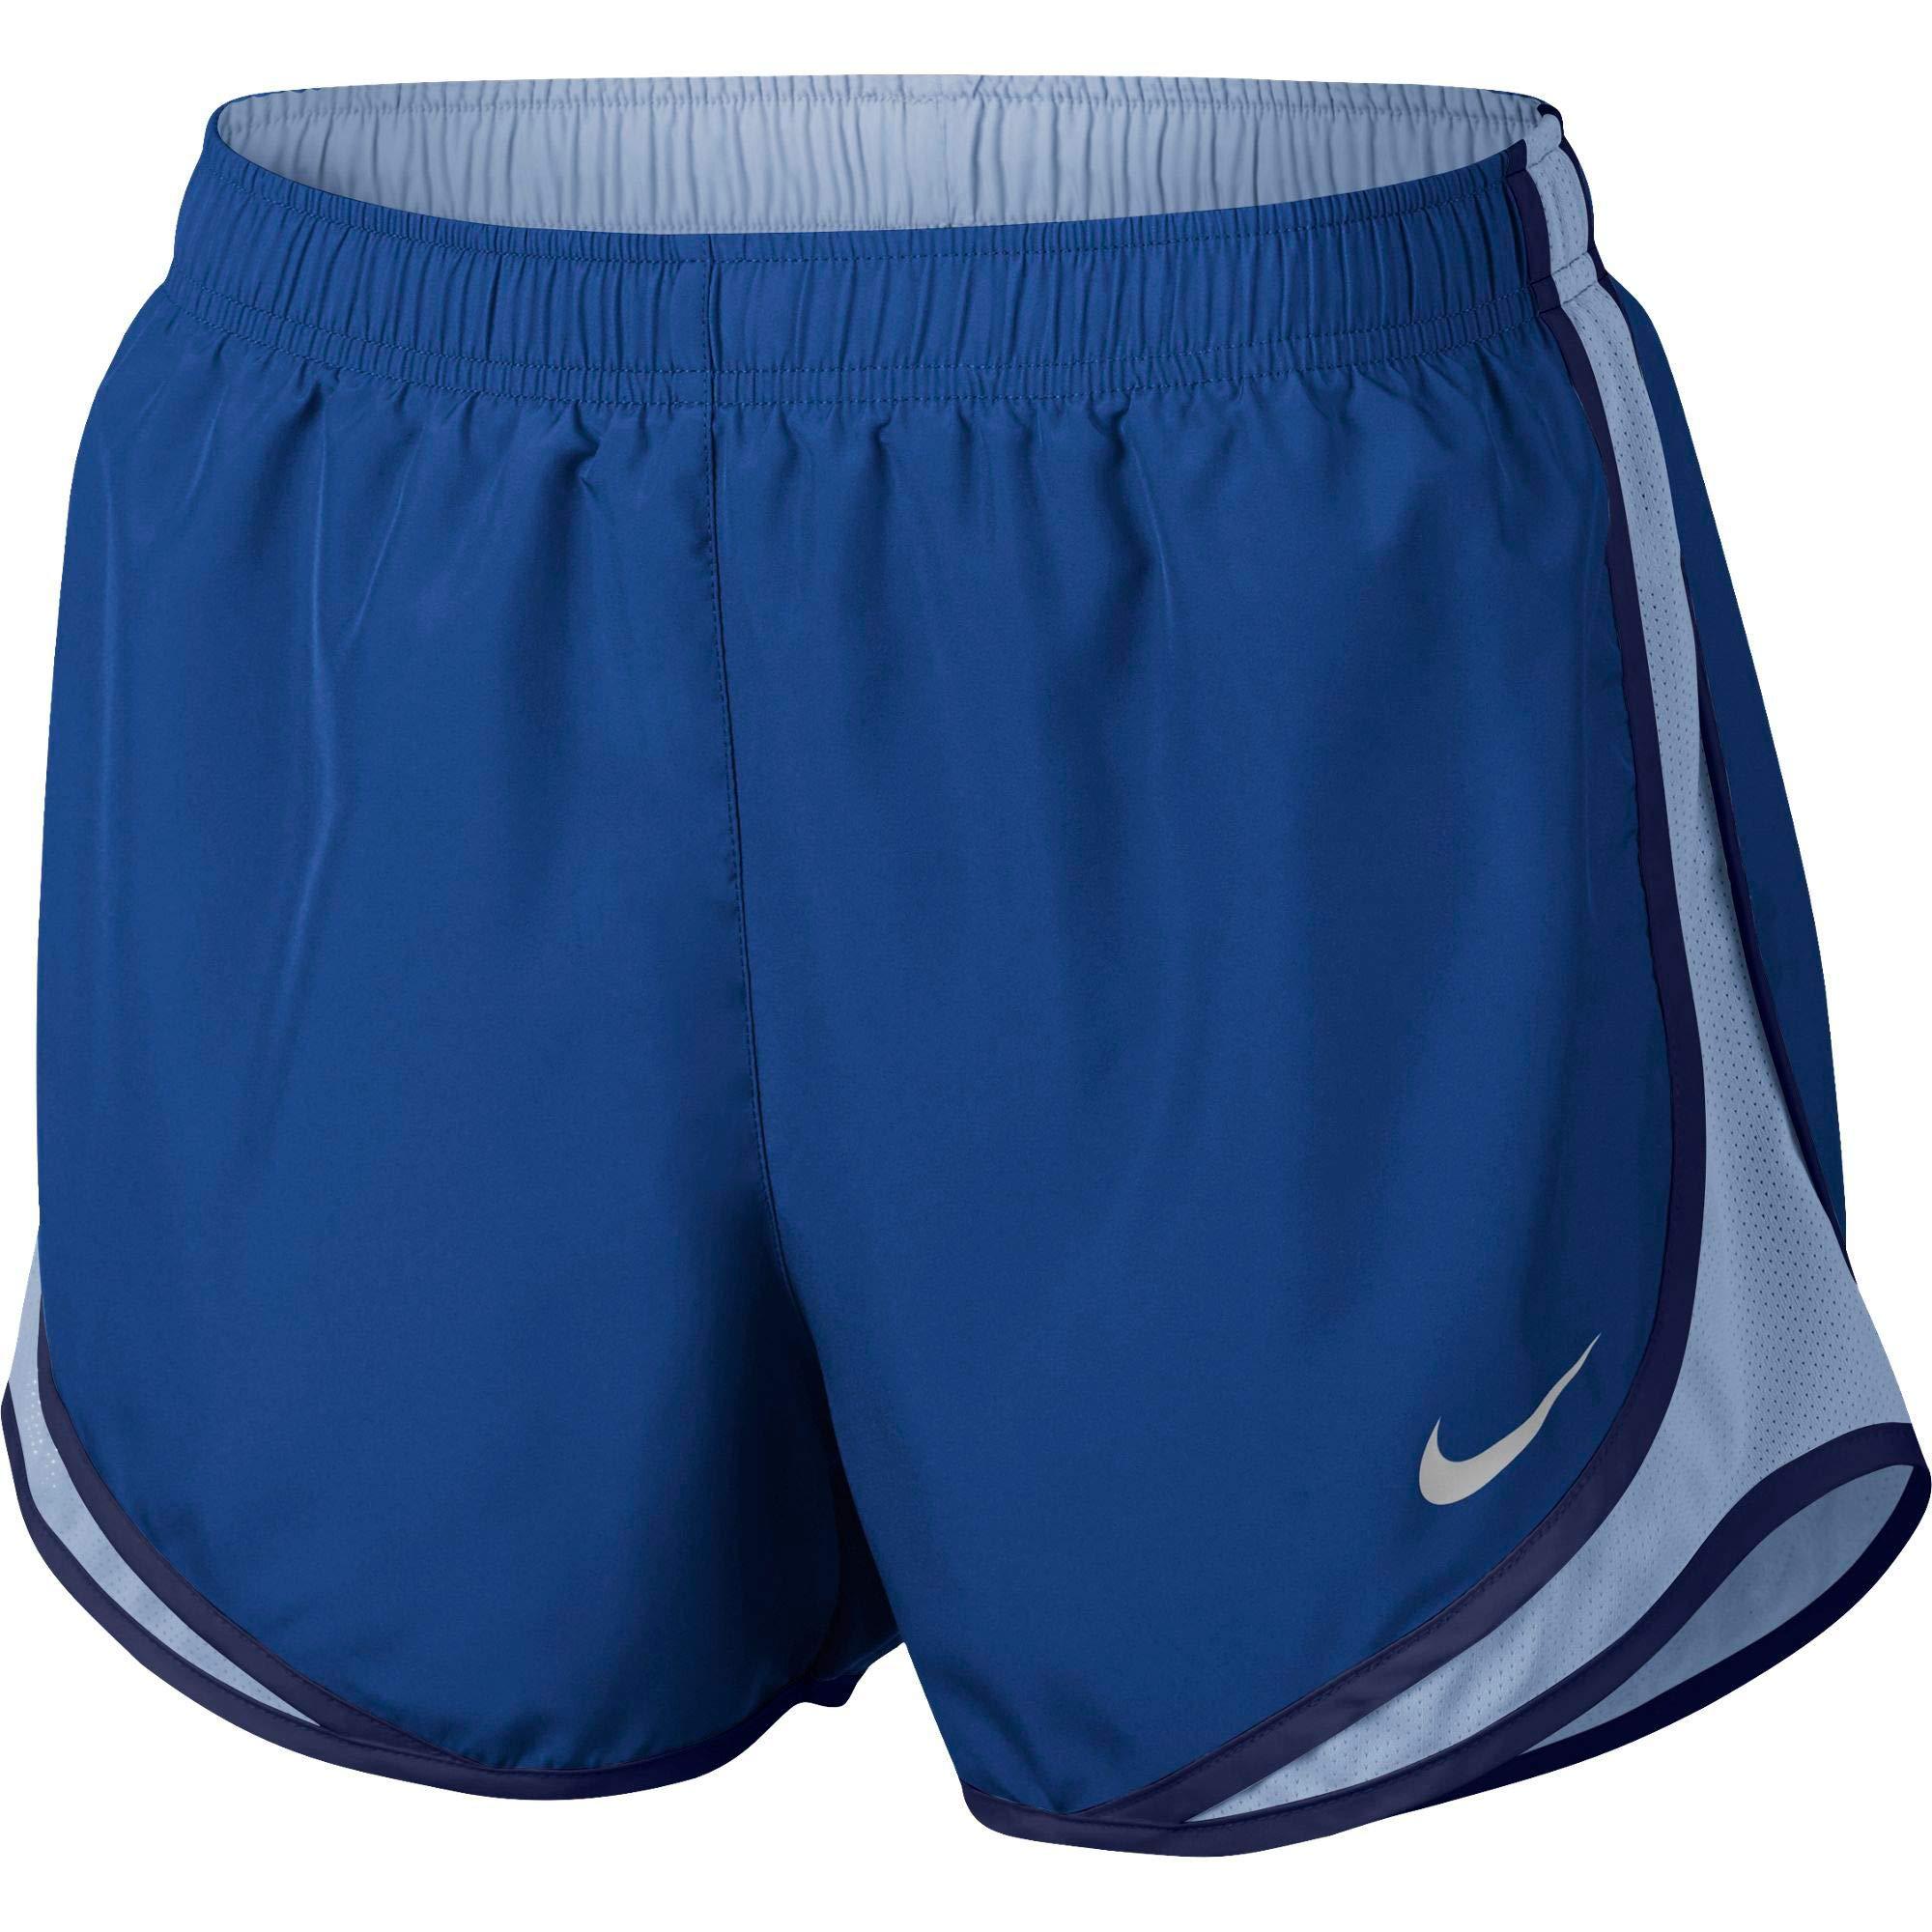 Nike Women's Dry Tempo Short Indigo Force/Indigo Fog/Wolf Grey Medium 3 by Nike